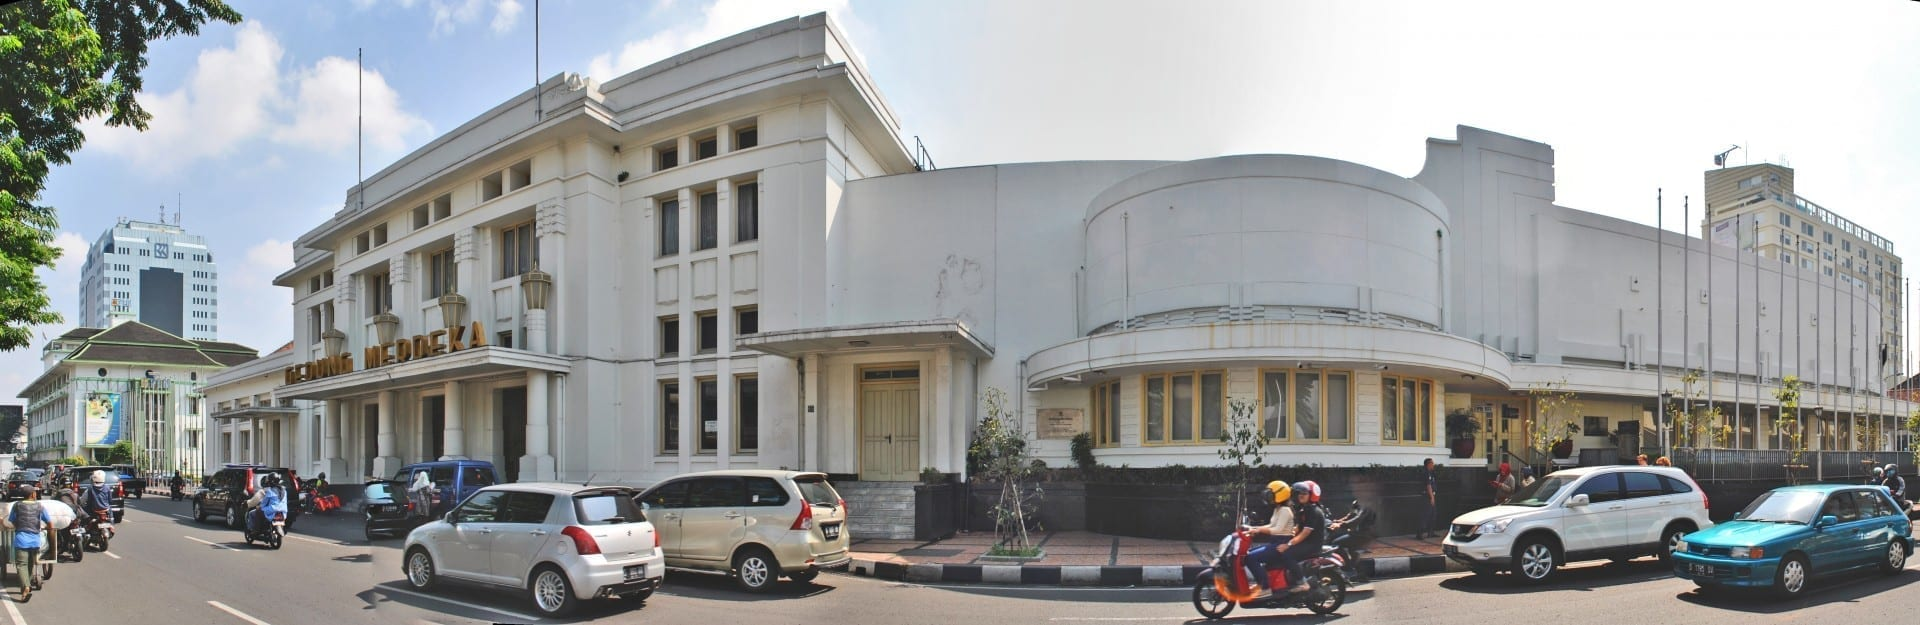 Gedung Merdeka en Central Bandung. Bandung Indonesia